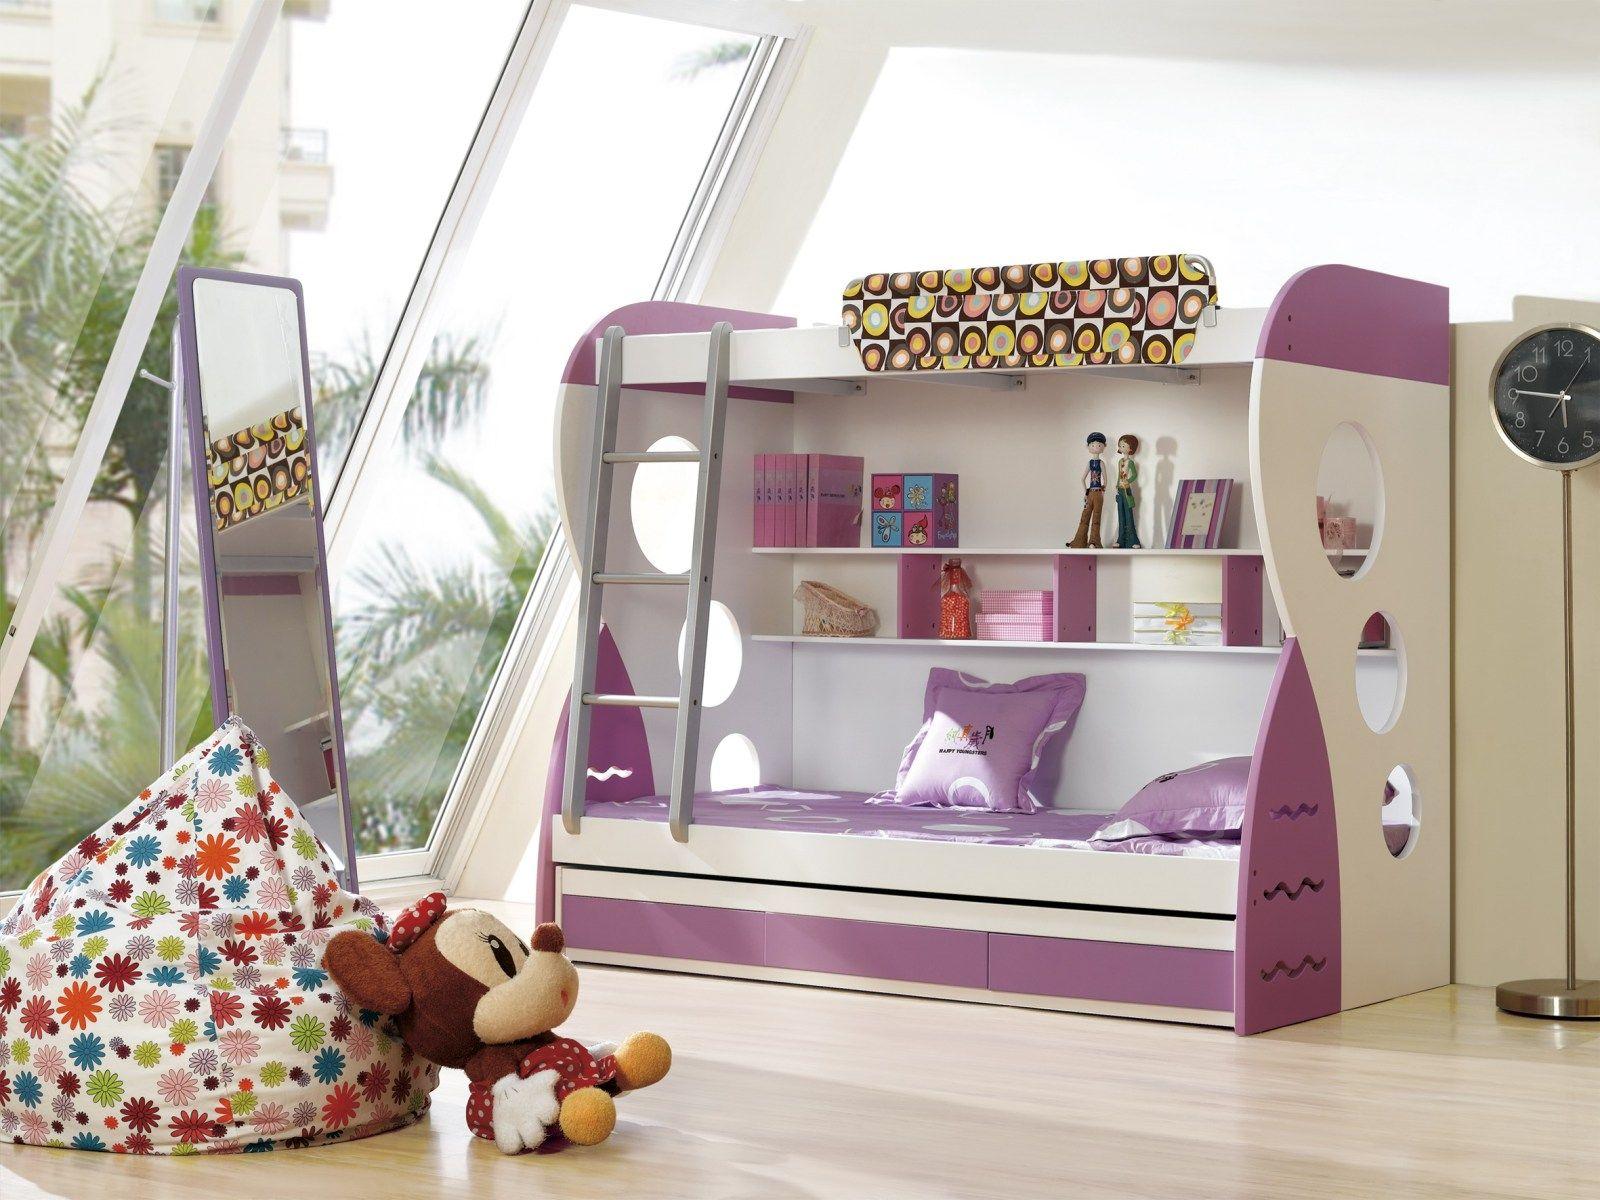 Etagenbett Rutsche Weiss : Betten mit rutschen für mädchen etagenbetten online ein etagenbett